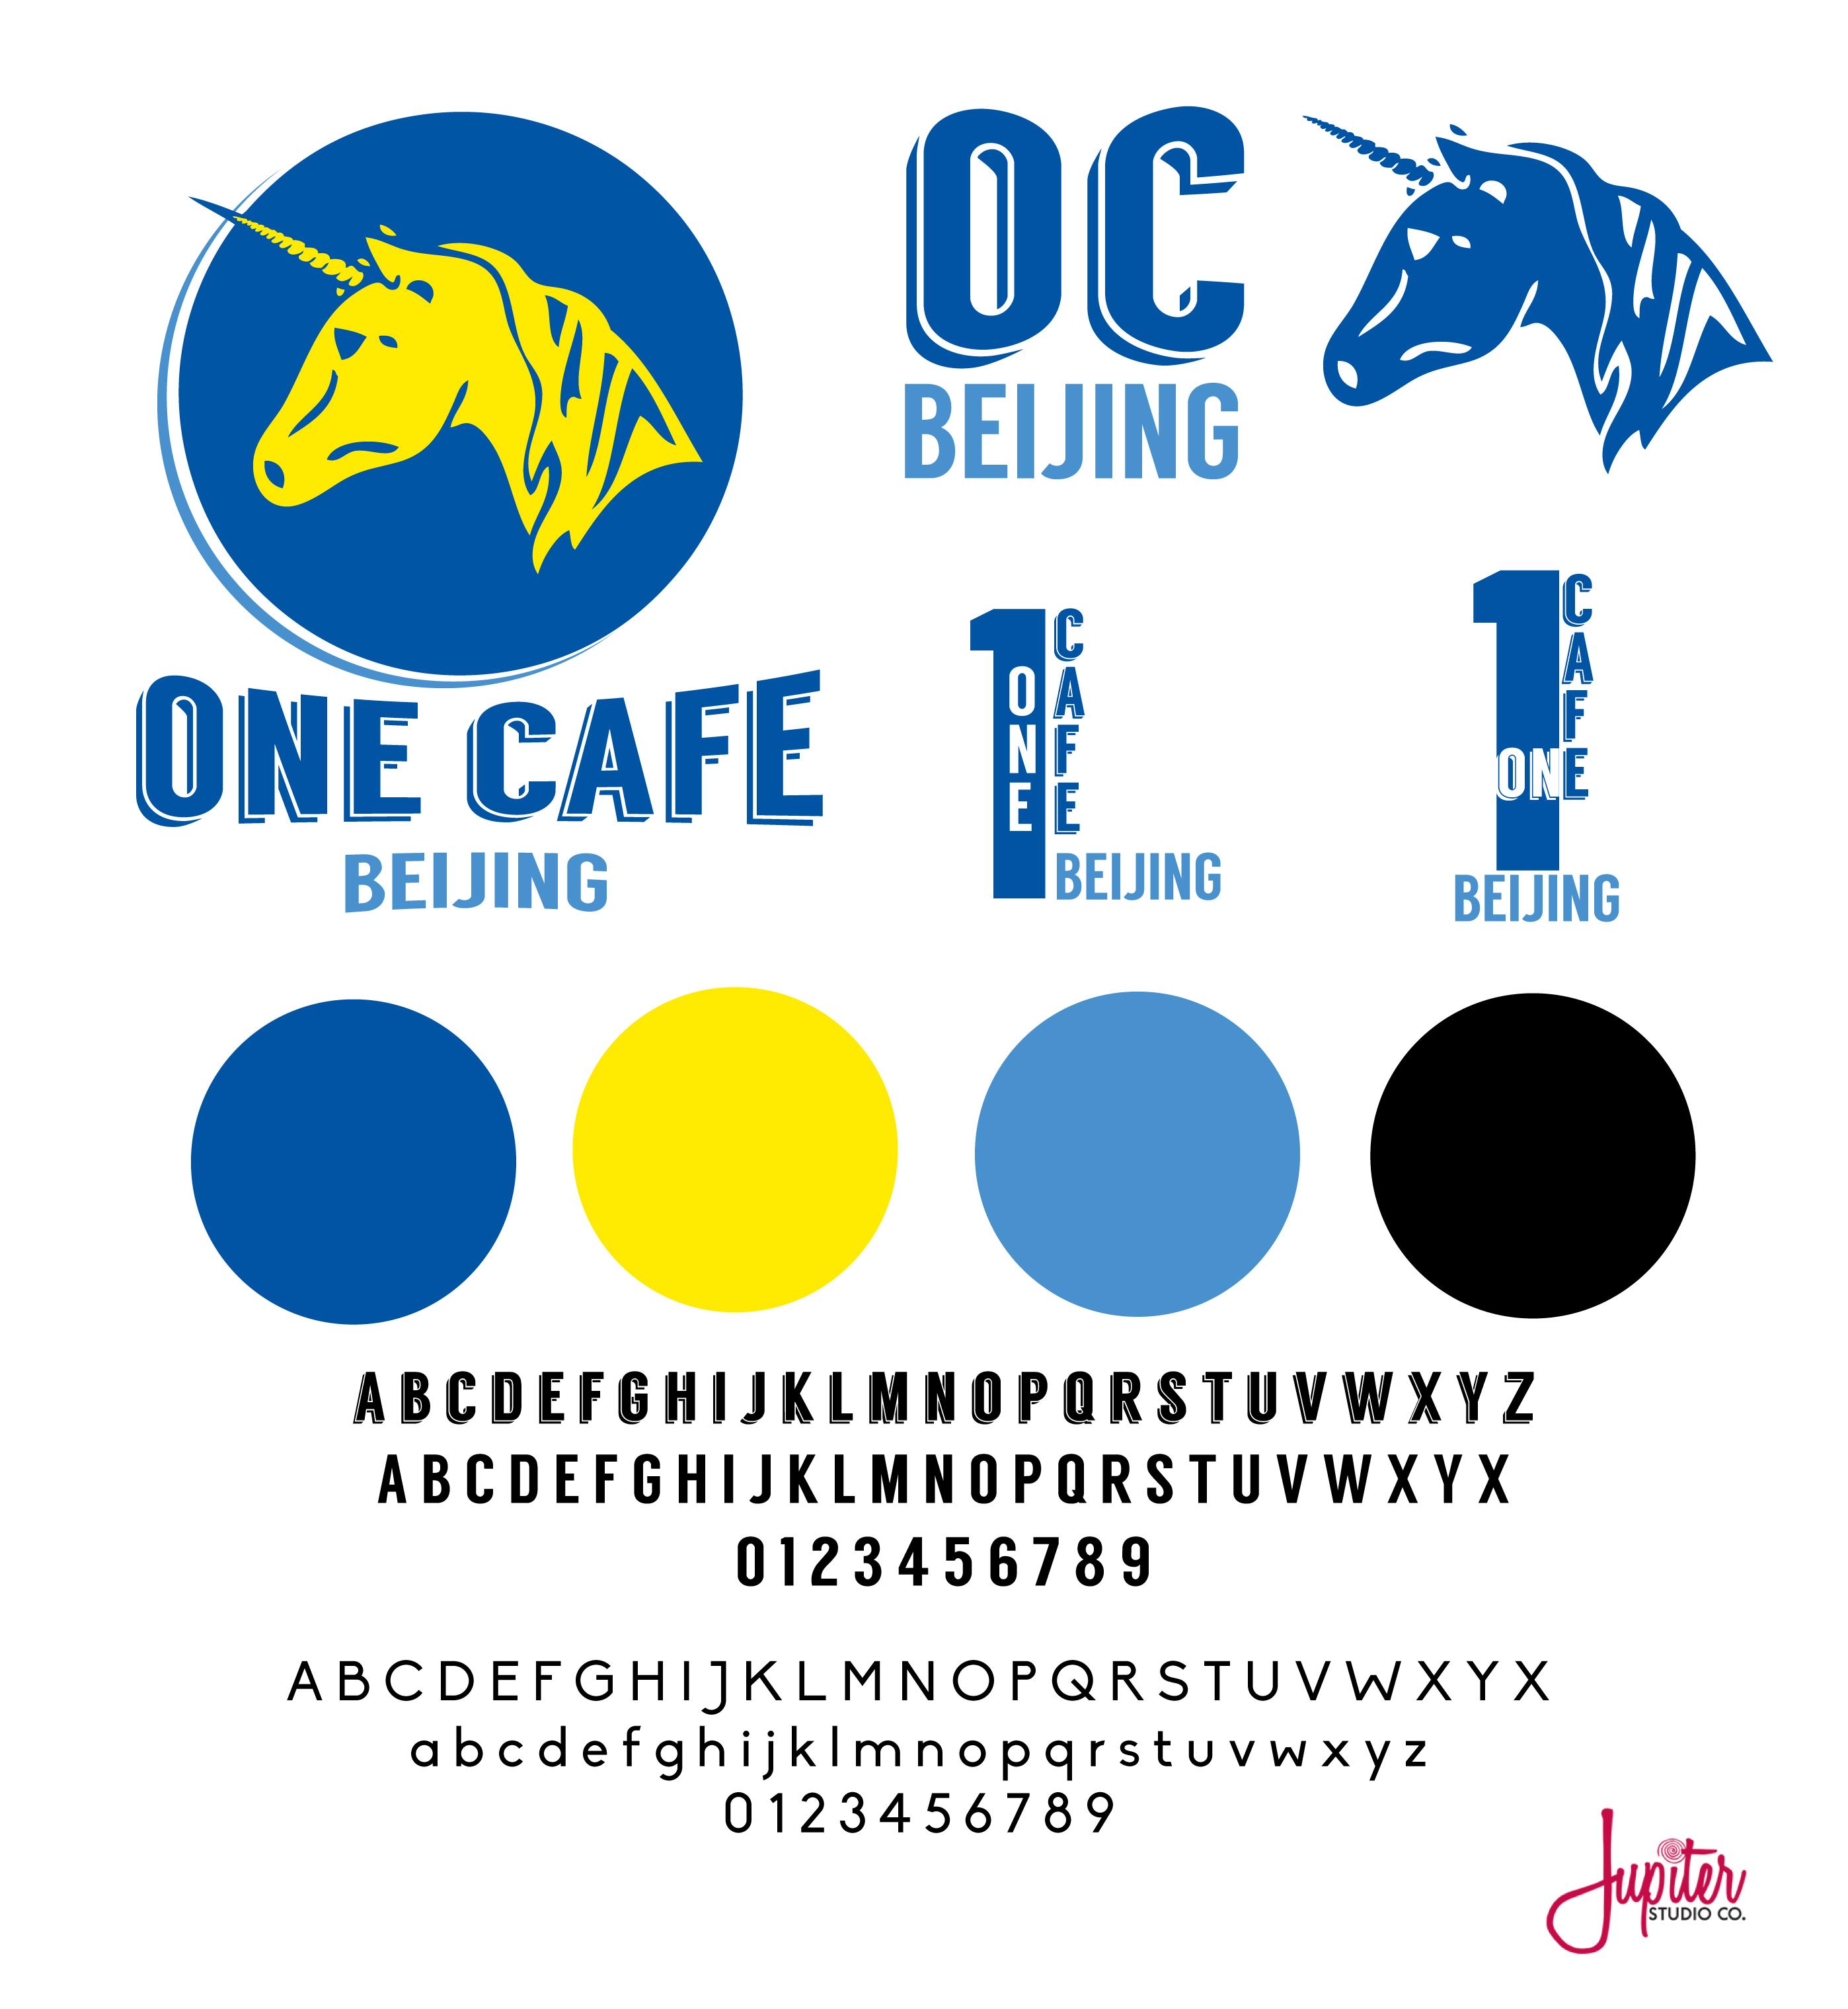 One Cafe - Beijing - Final